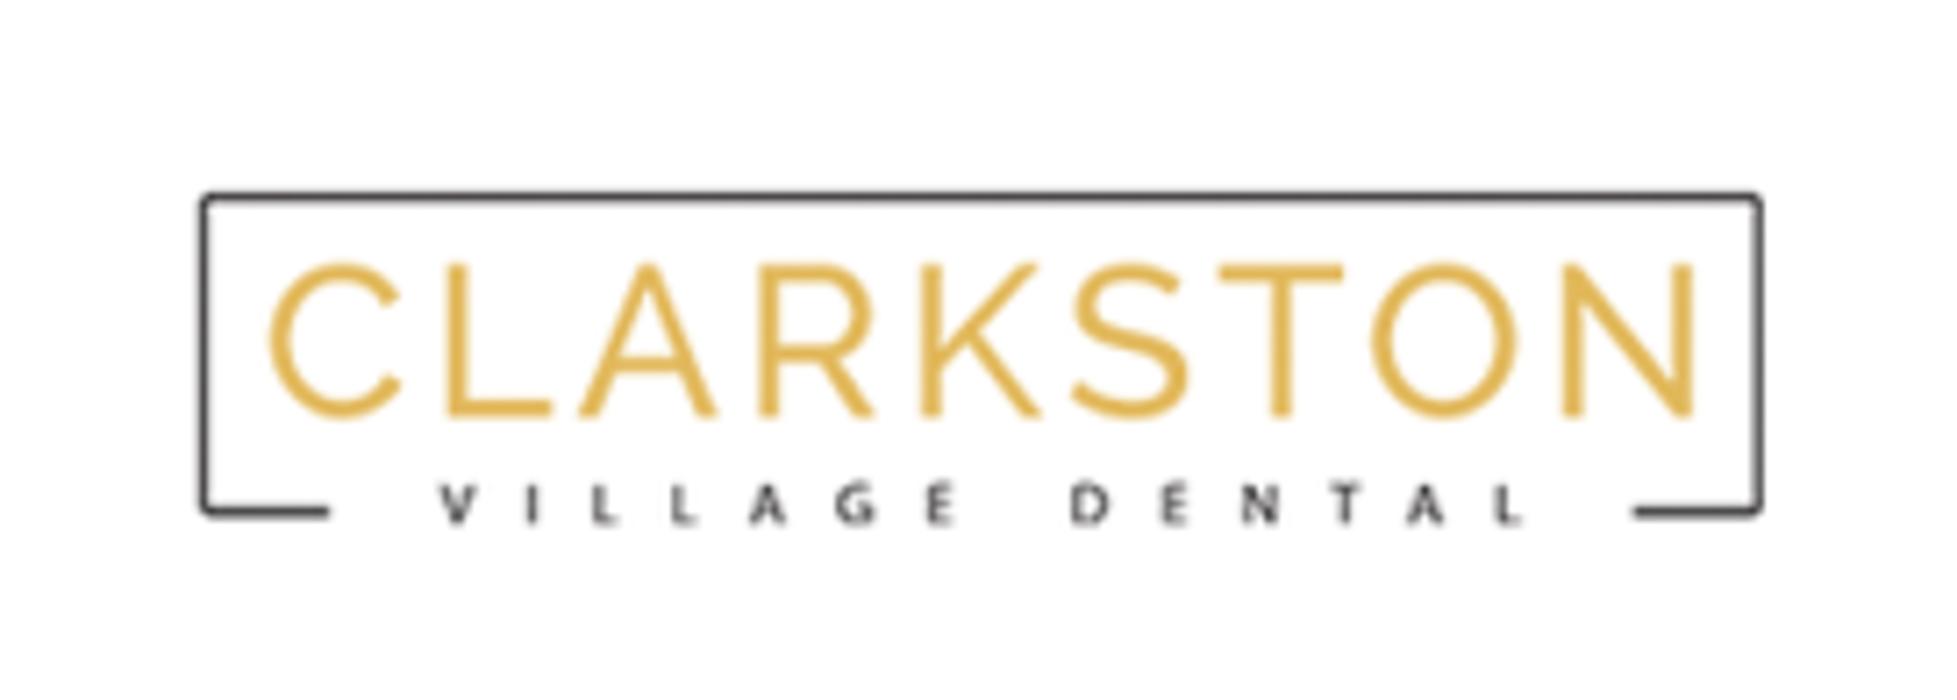 Clarkston Village Dental - Clarkston, MI